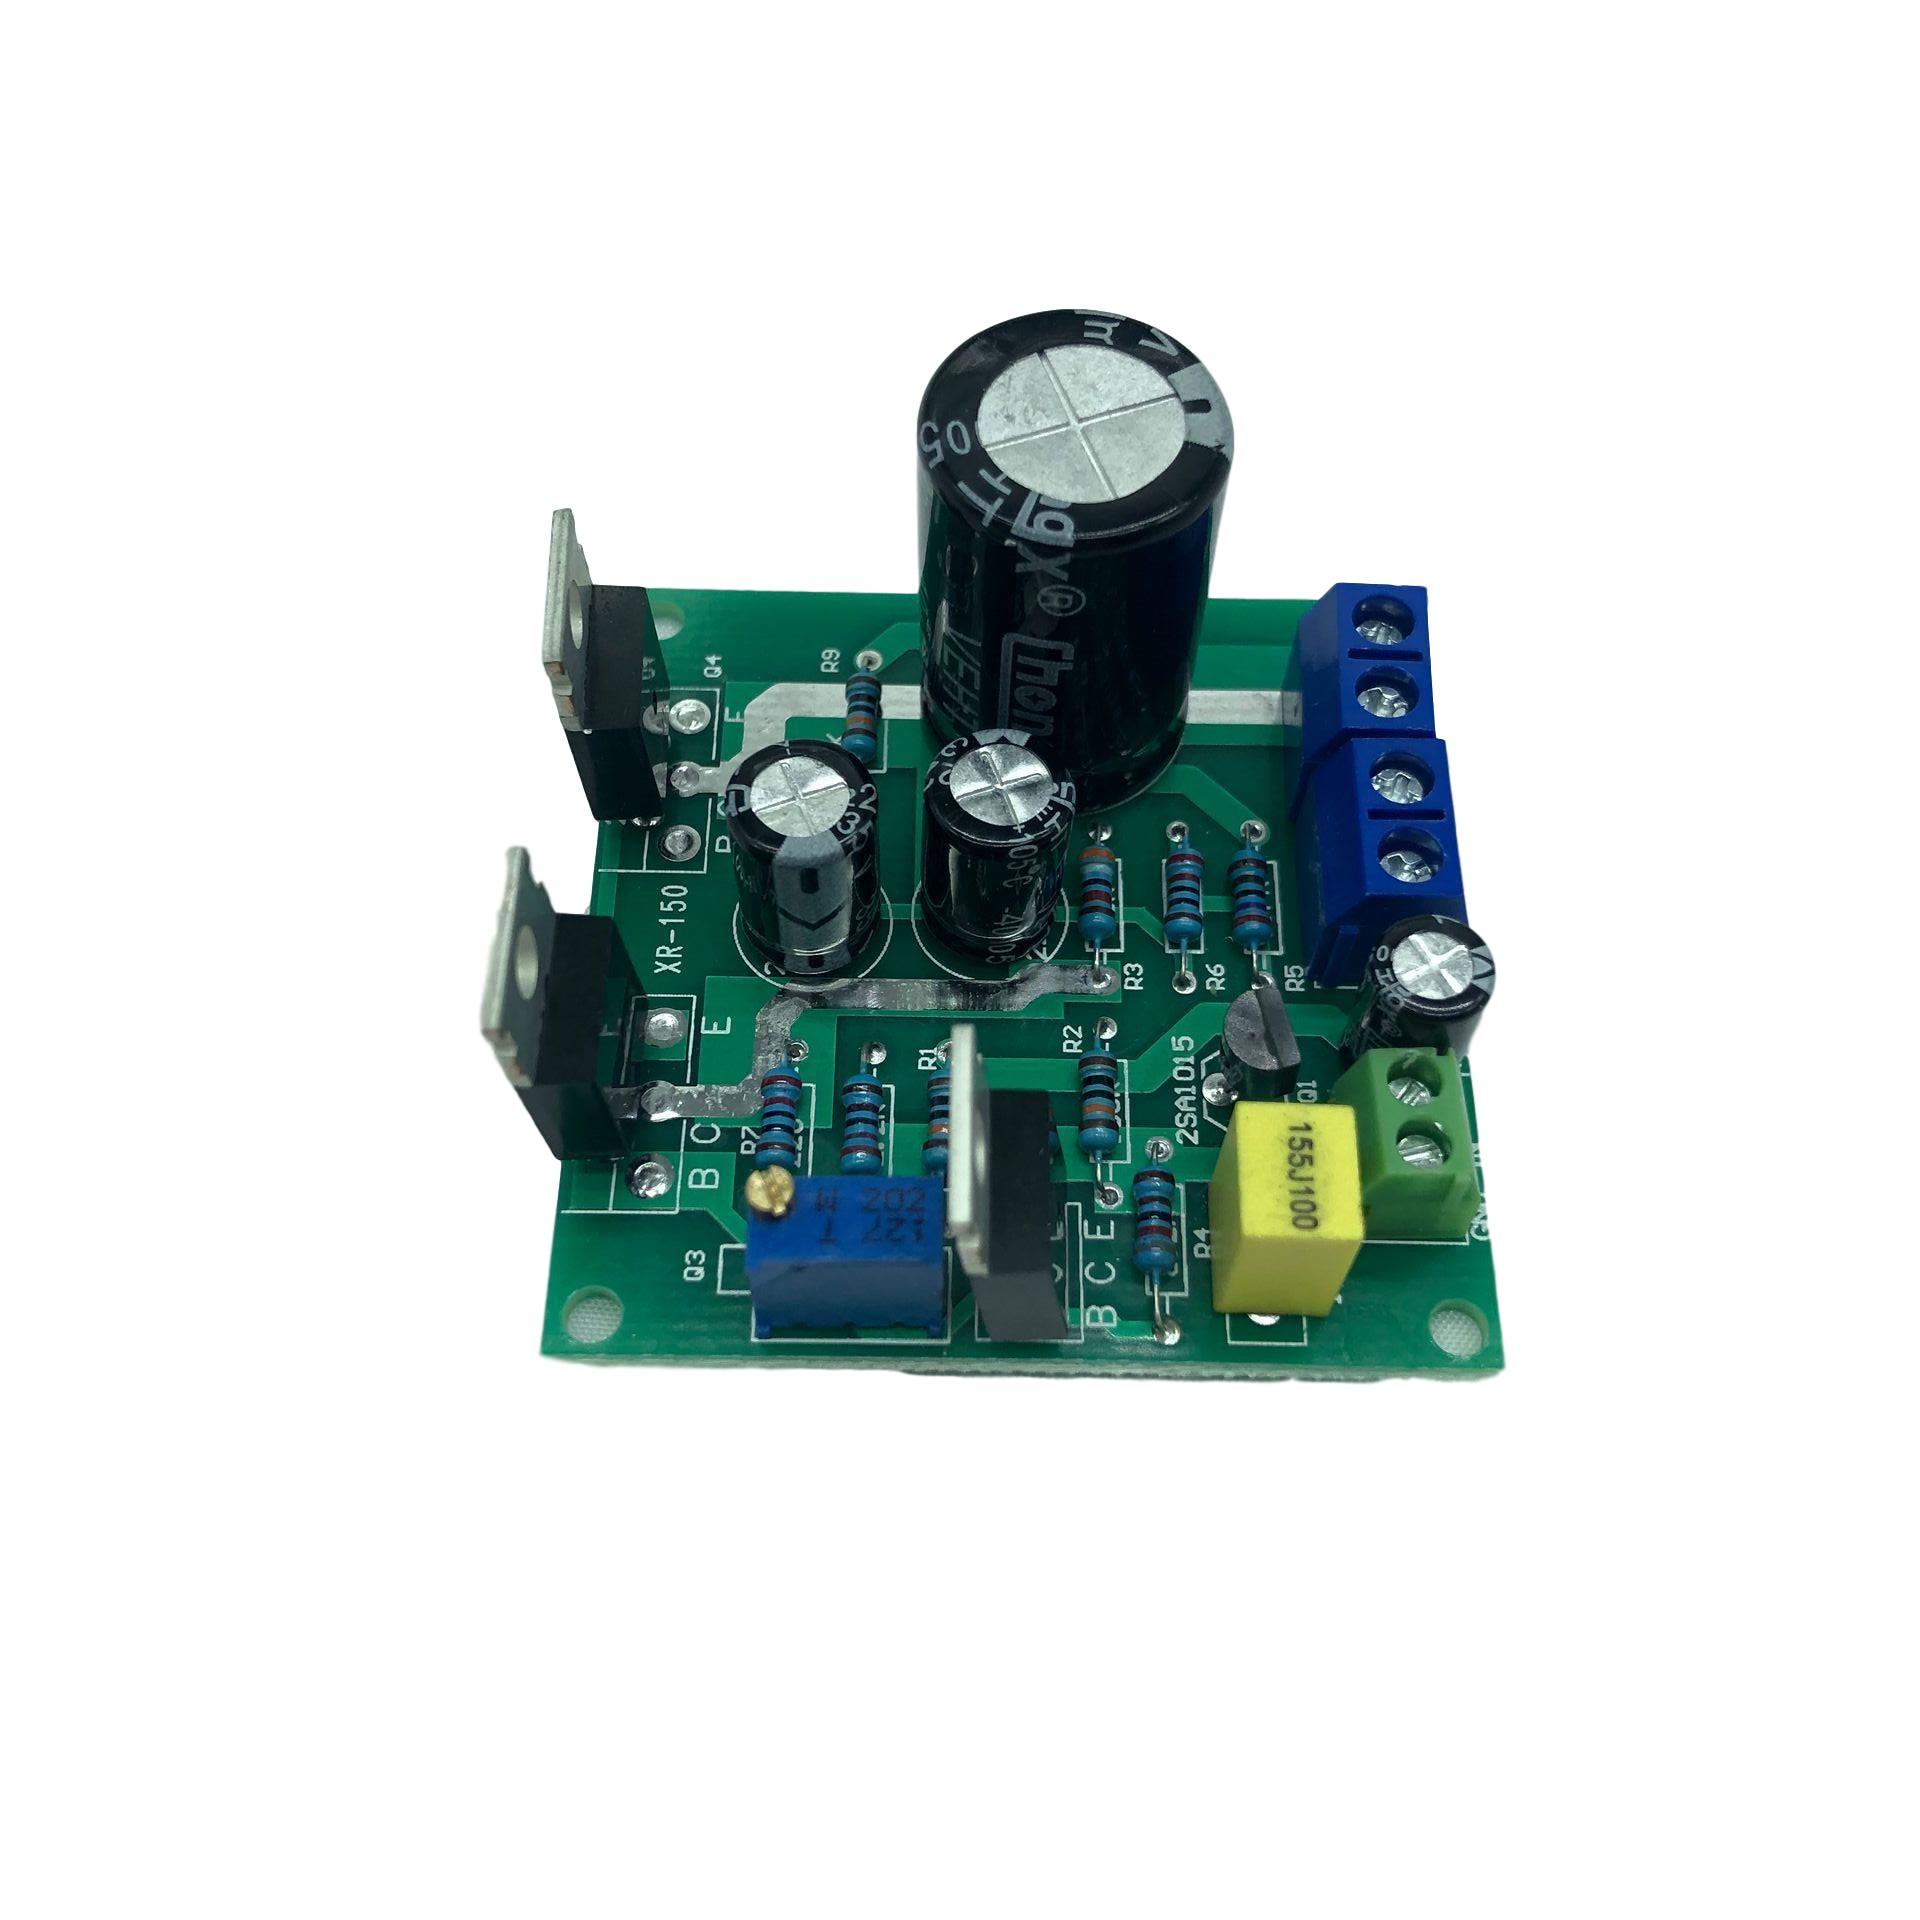 DC 12V-30V 24V Mini 1969 TIP41C Assemble Pure Class A 1 CH Amplifier Board